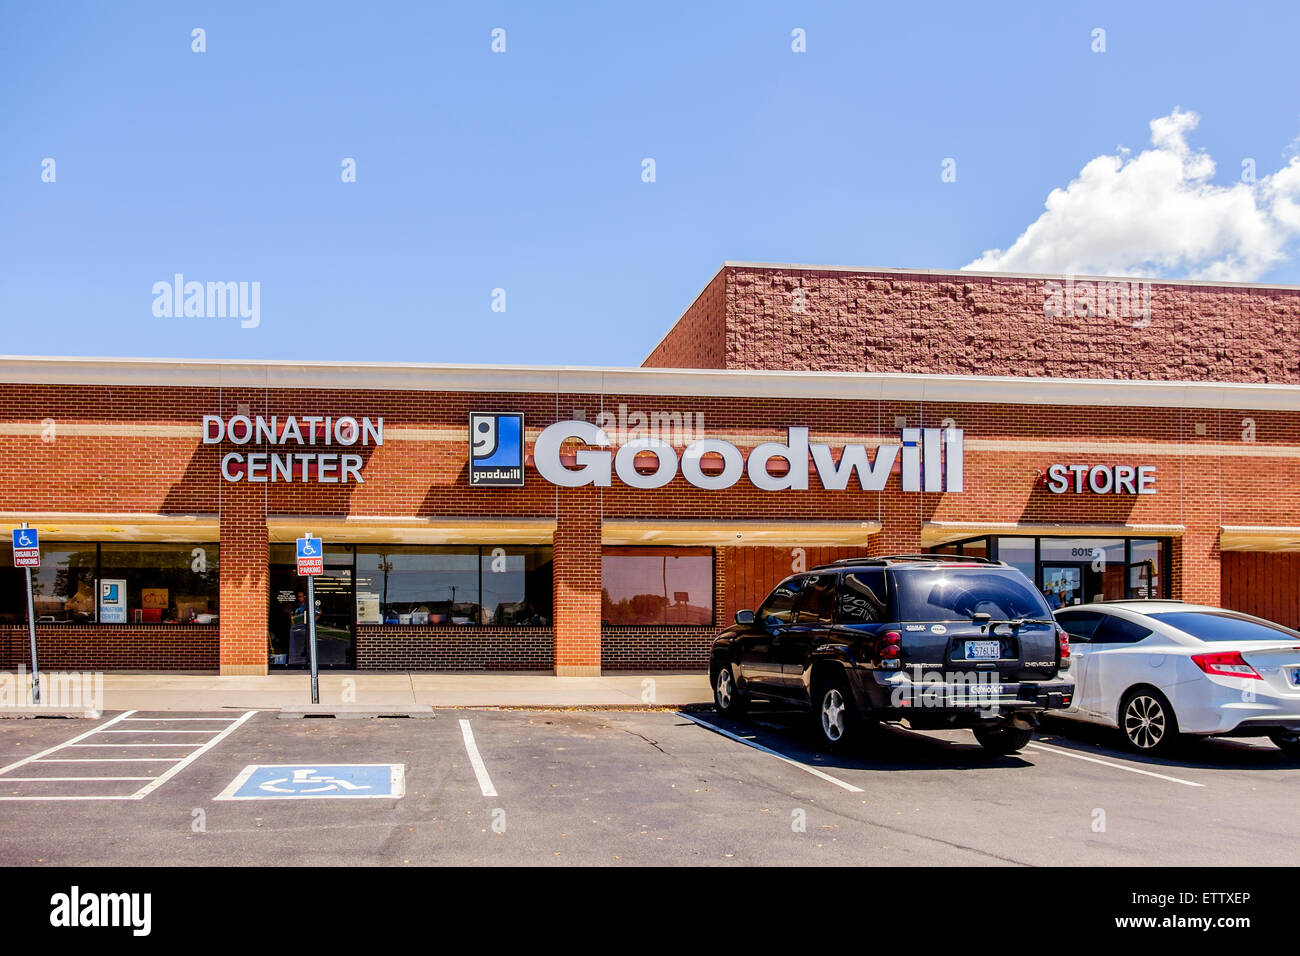 The exterior of a Goodwill Donation Center in Oklahoma City, Oklahoma, USA. - Stock Image